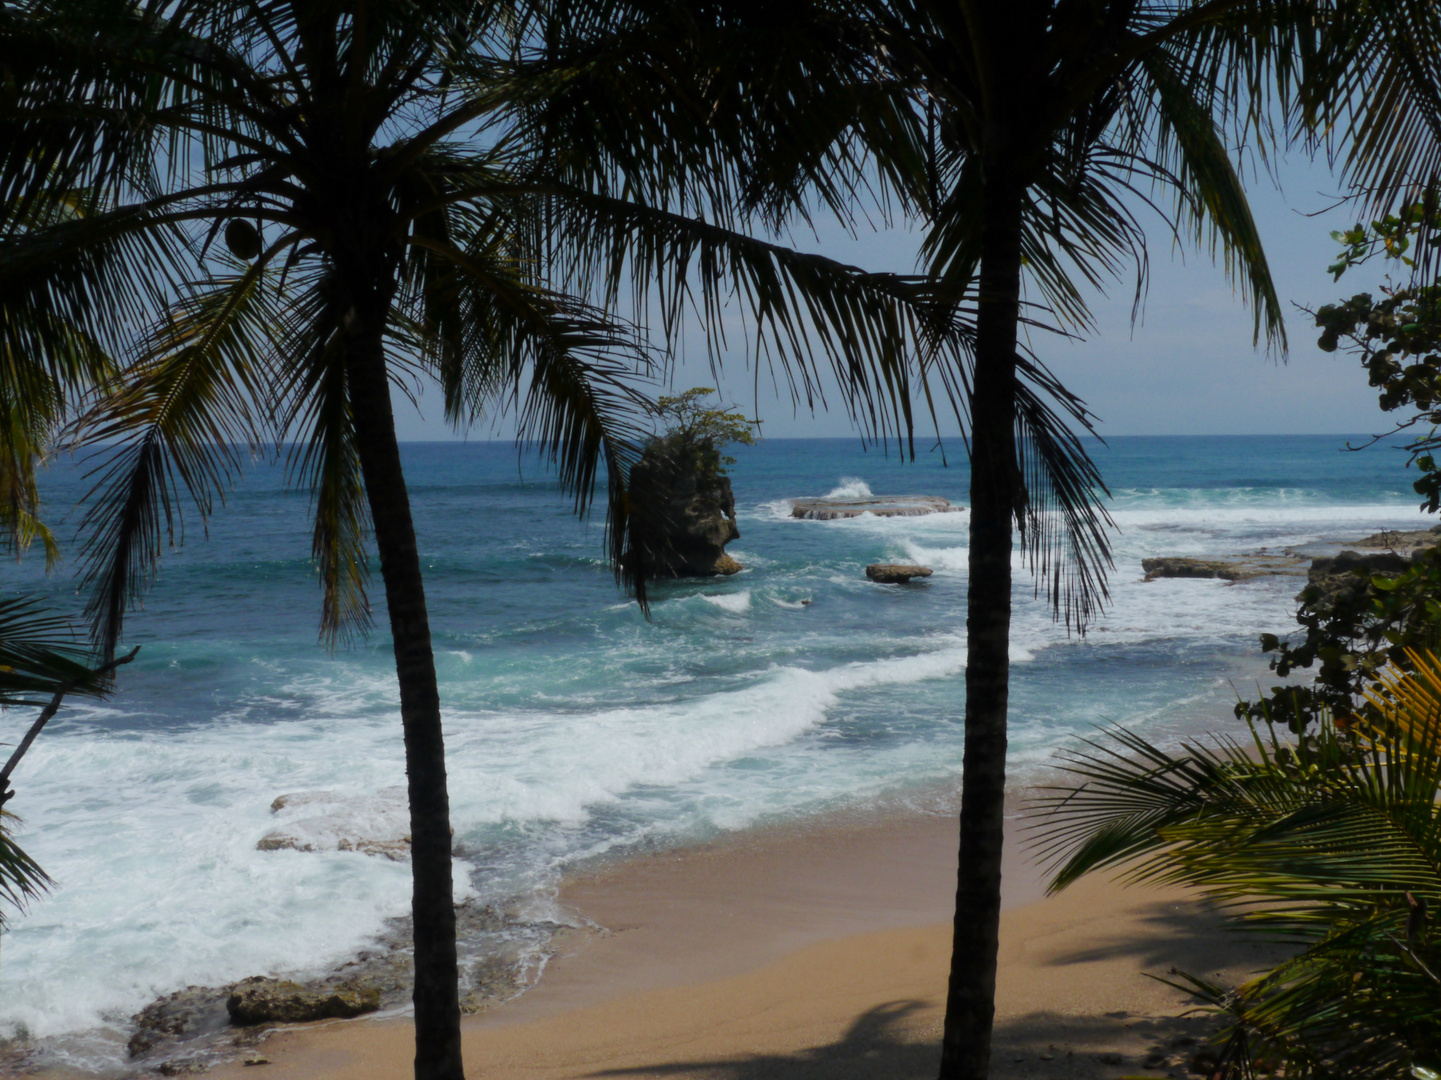 Karibikküste - Costa Rica